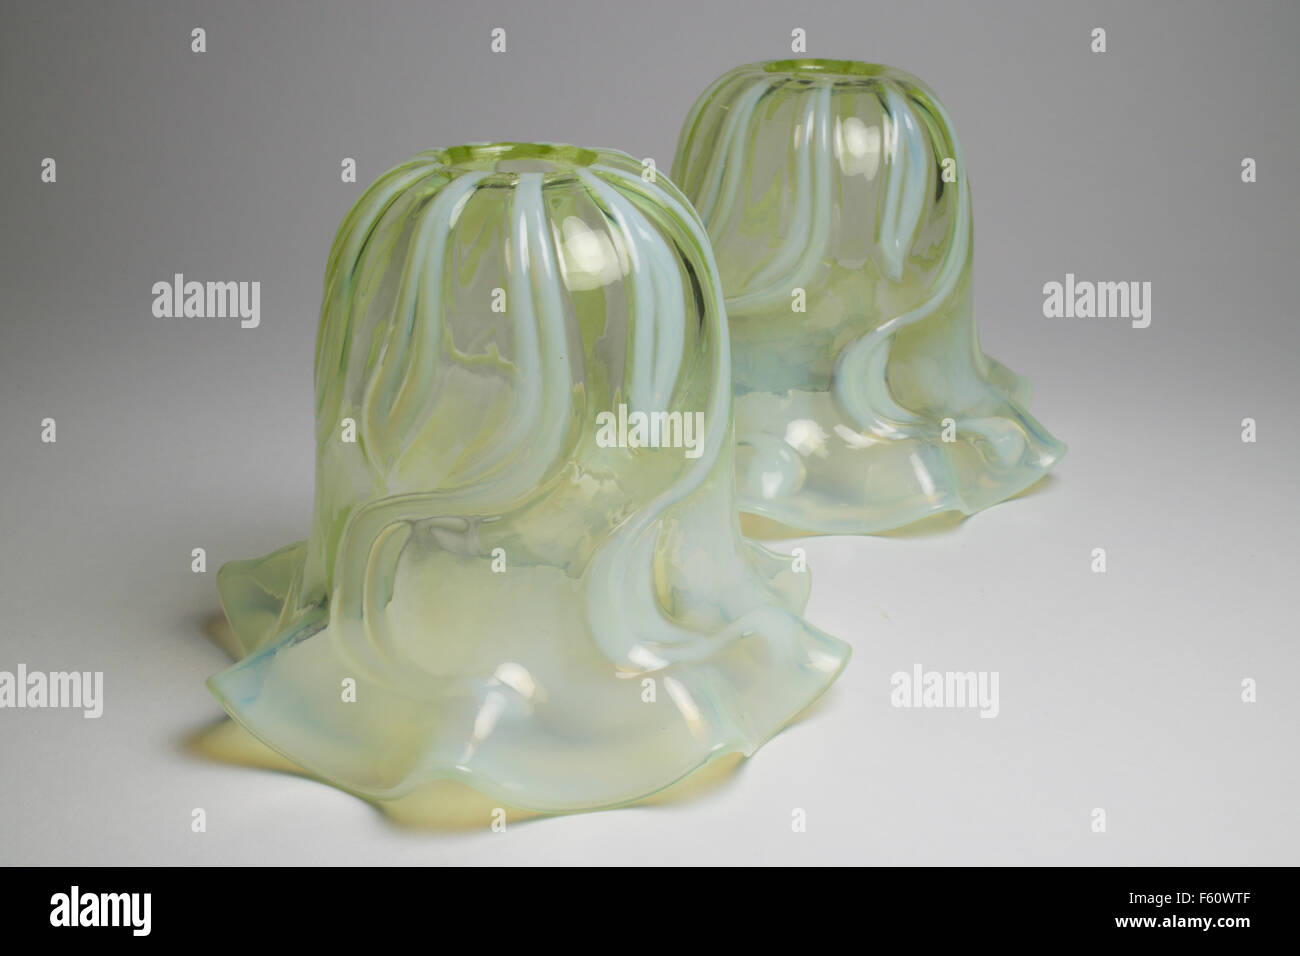 Antique Pair Of Art Nouveau Opalescent Glass Light Lamp Shades Stock Photo Alamy